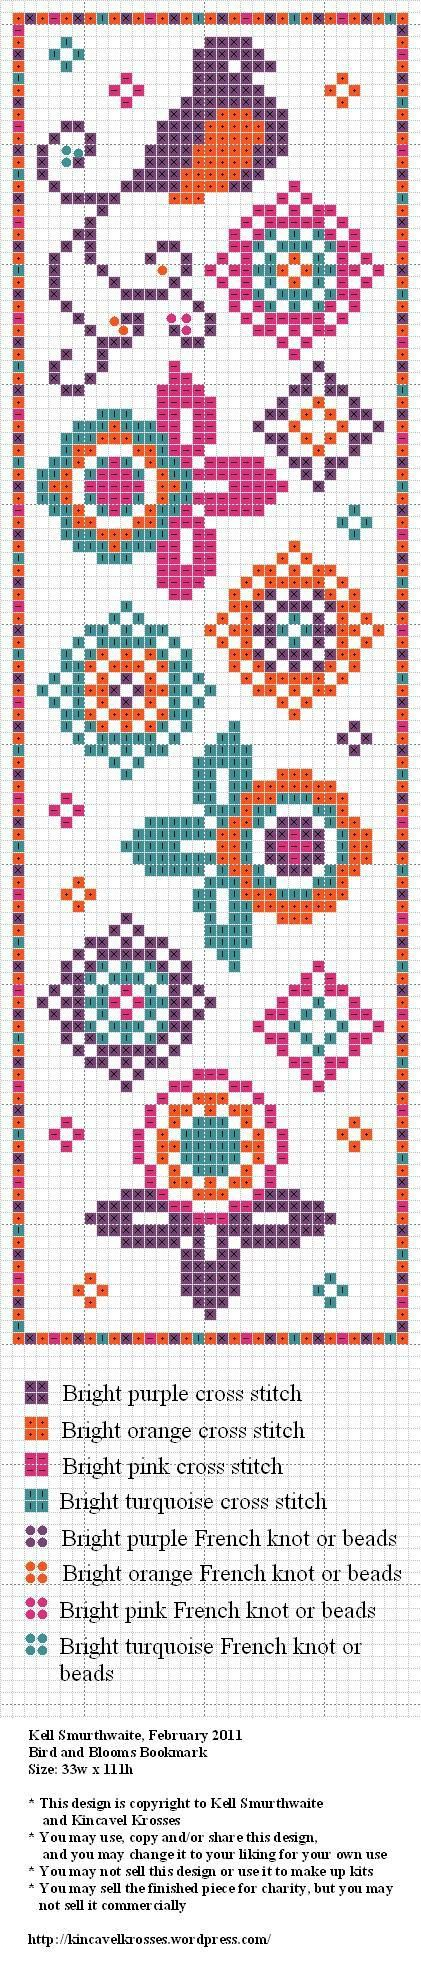 Bird and blooms Bookmark♥Cross stitch chart♥